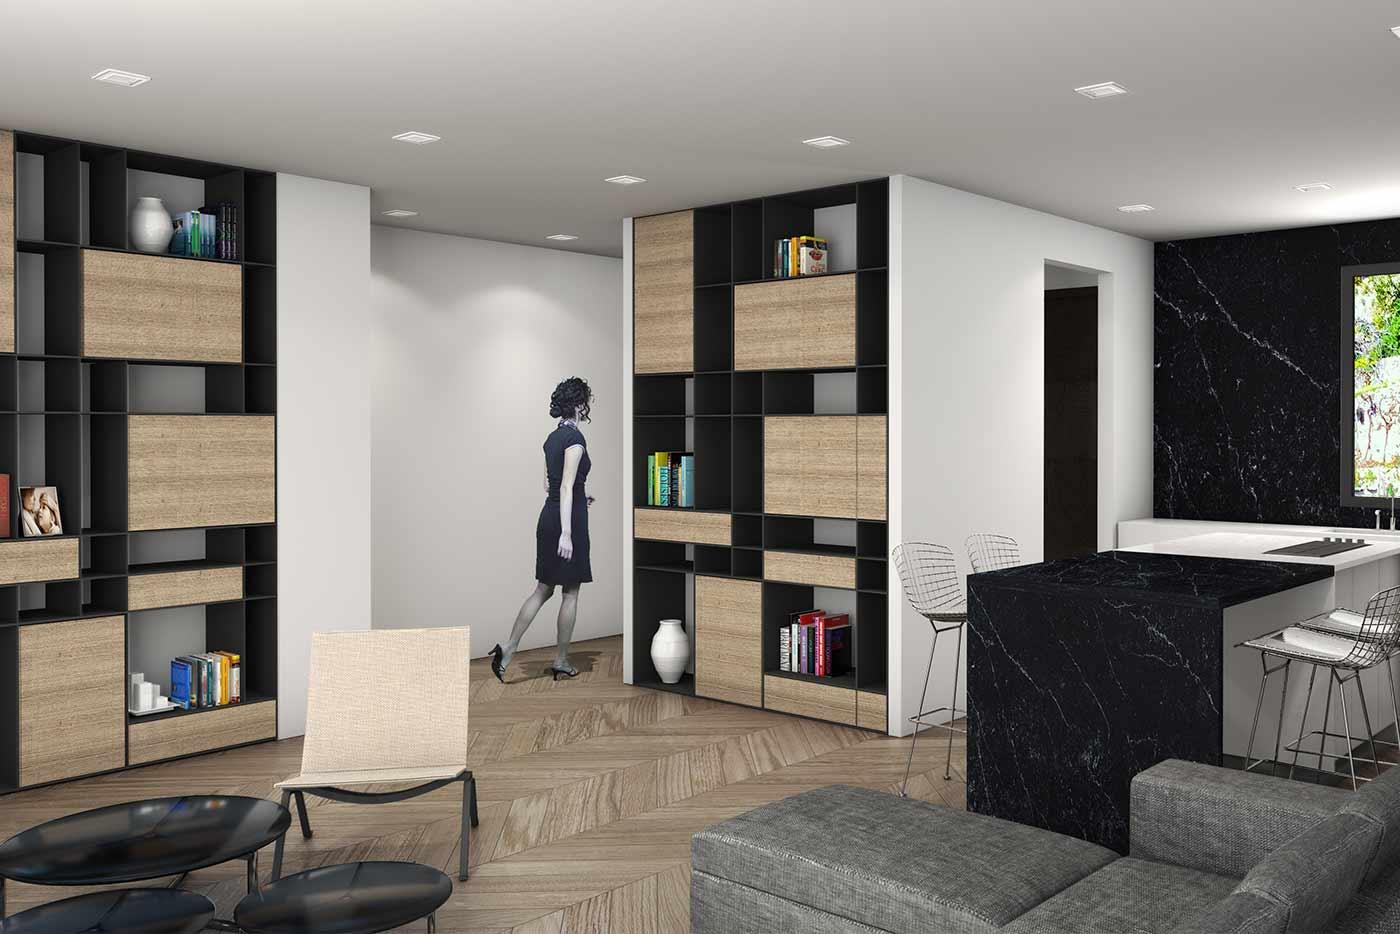 mers monts am nagement bear architectes agence architecture jeremy biermann. Black Bedroom Furniture Sets. Home Design Ideas